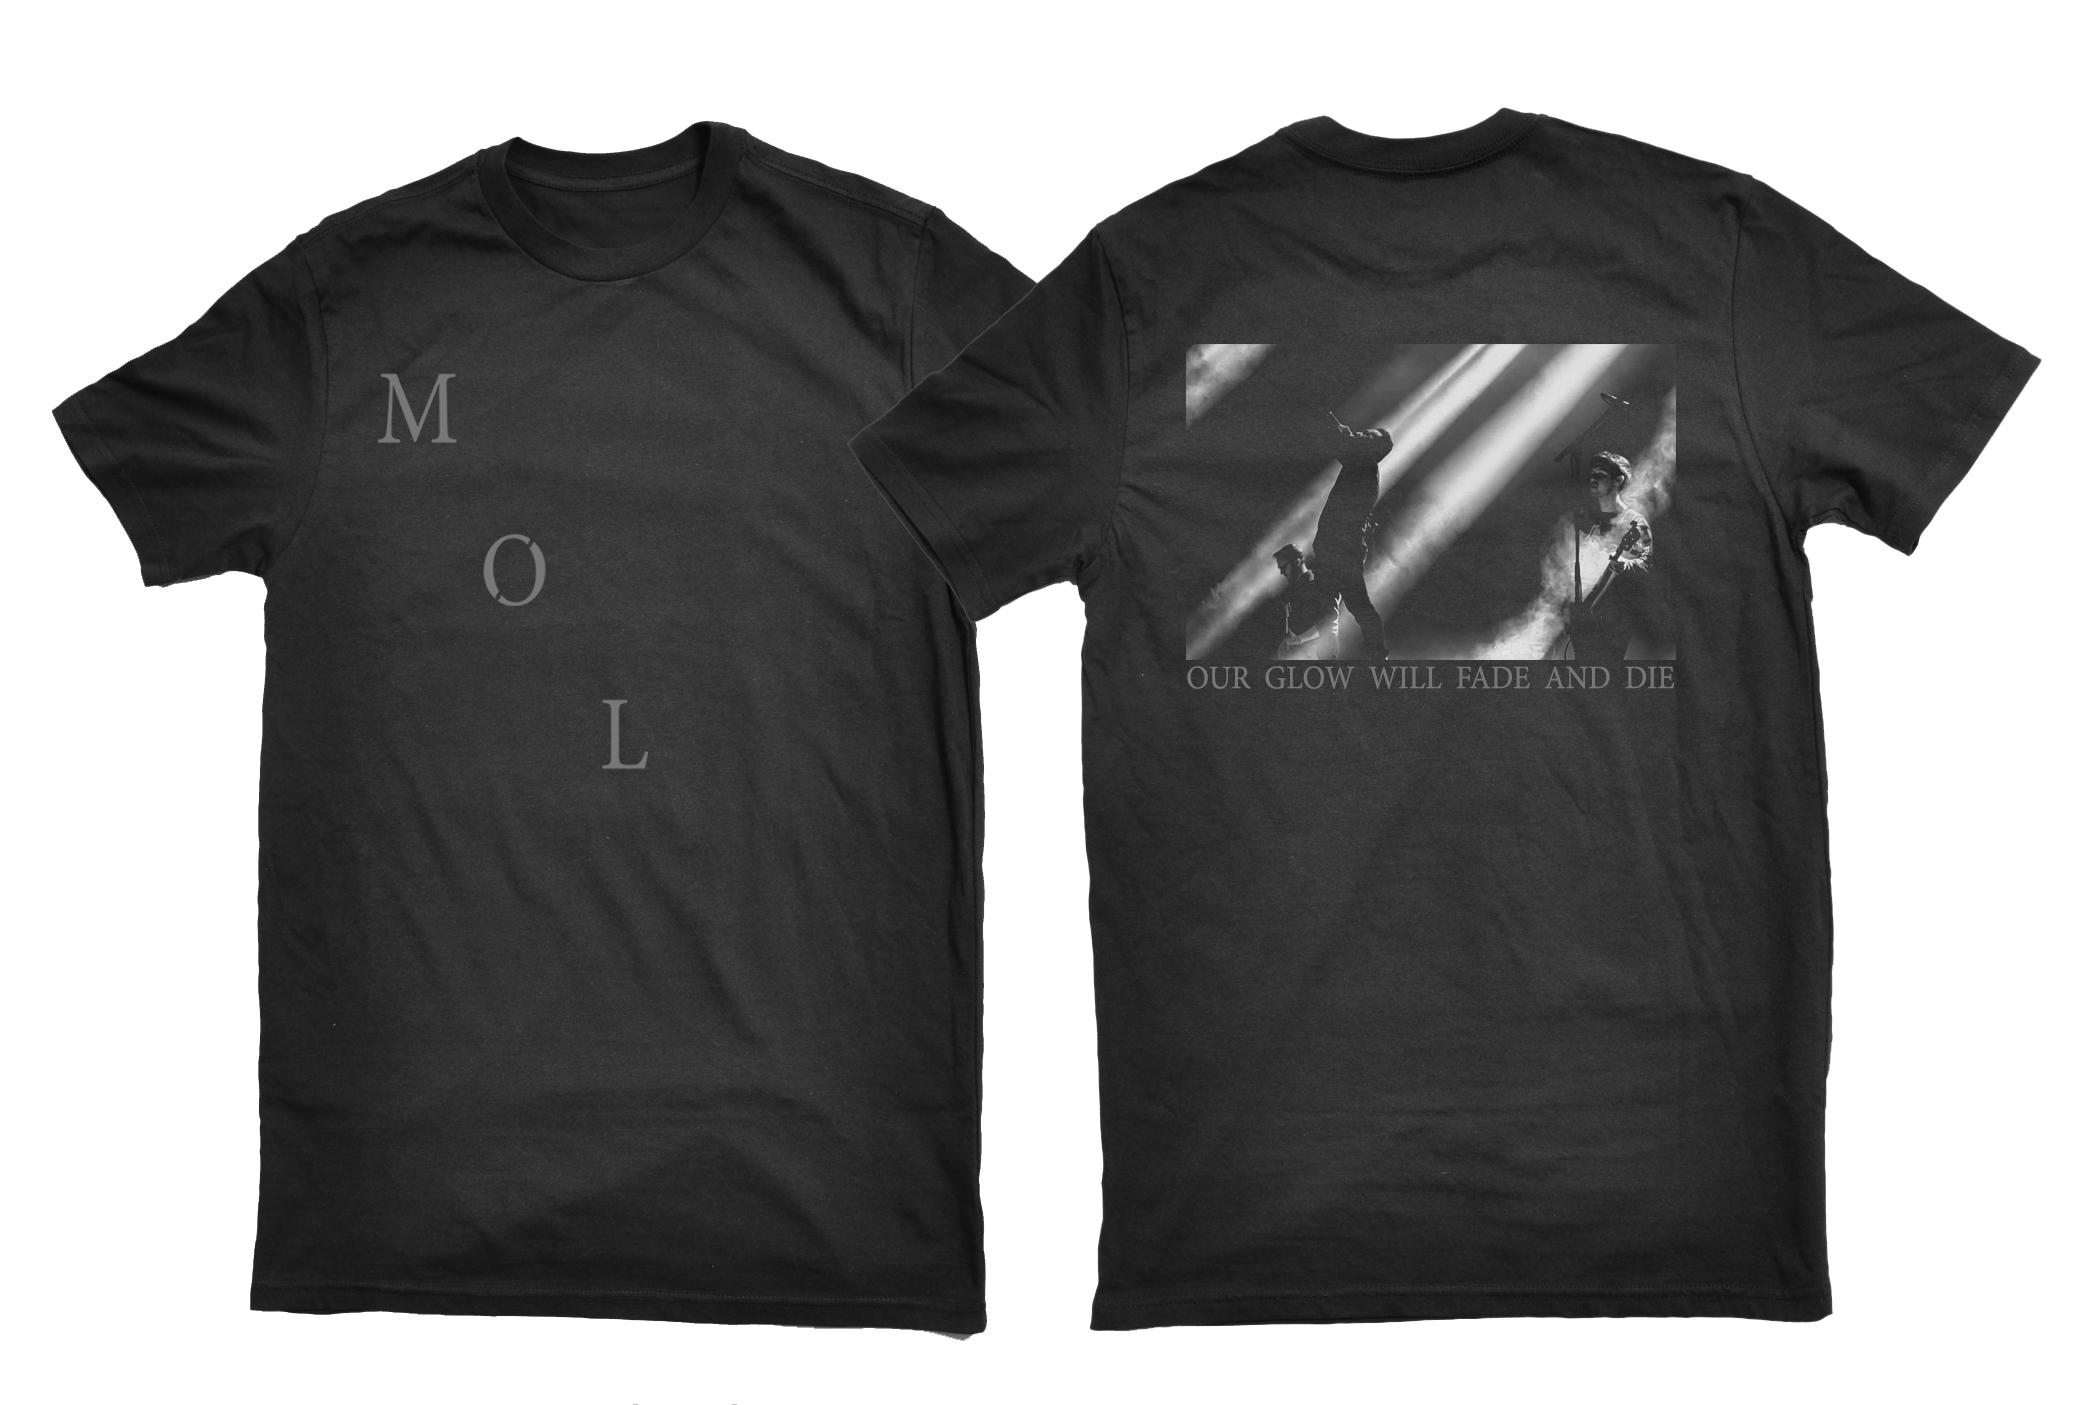 MØL live shirt